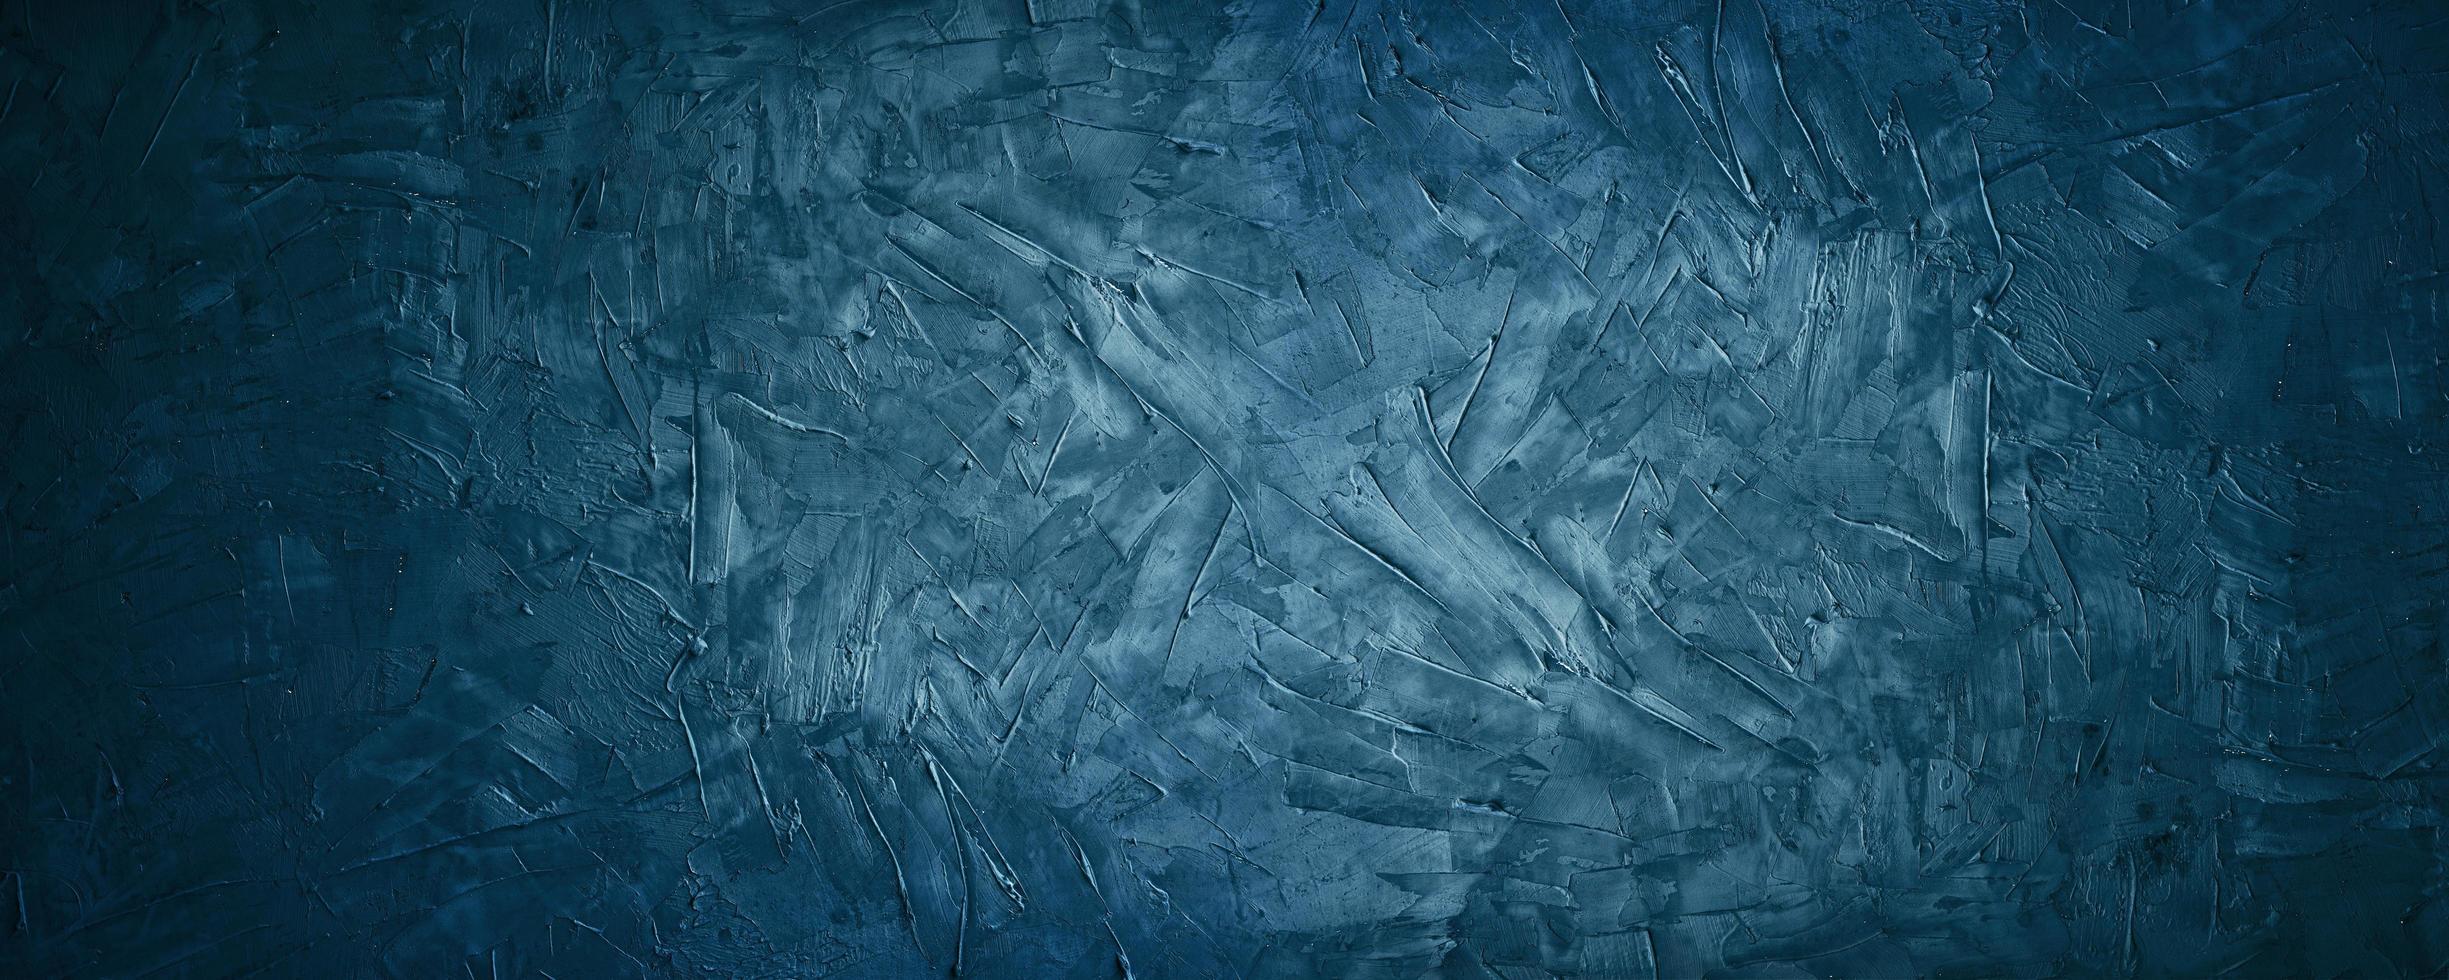 donkerblauwe grunge en textuurcement of concreate achtergrond foto